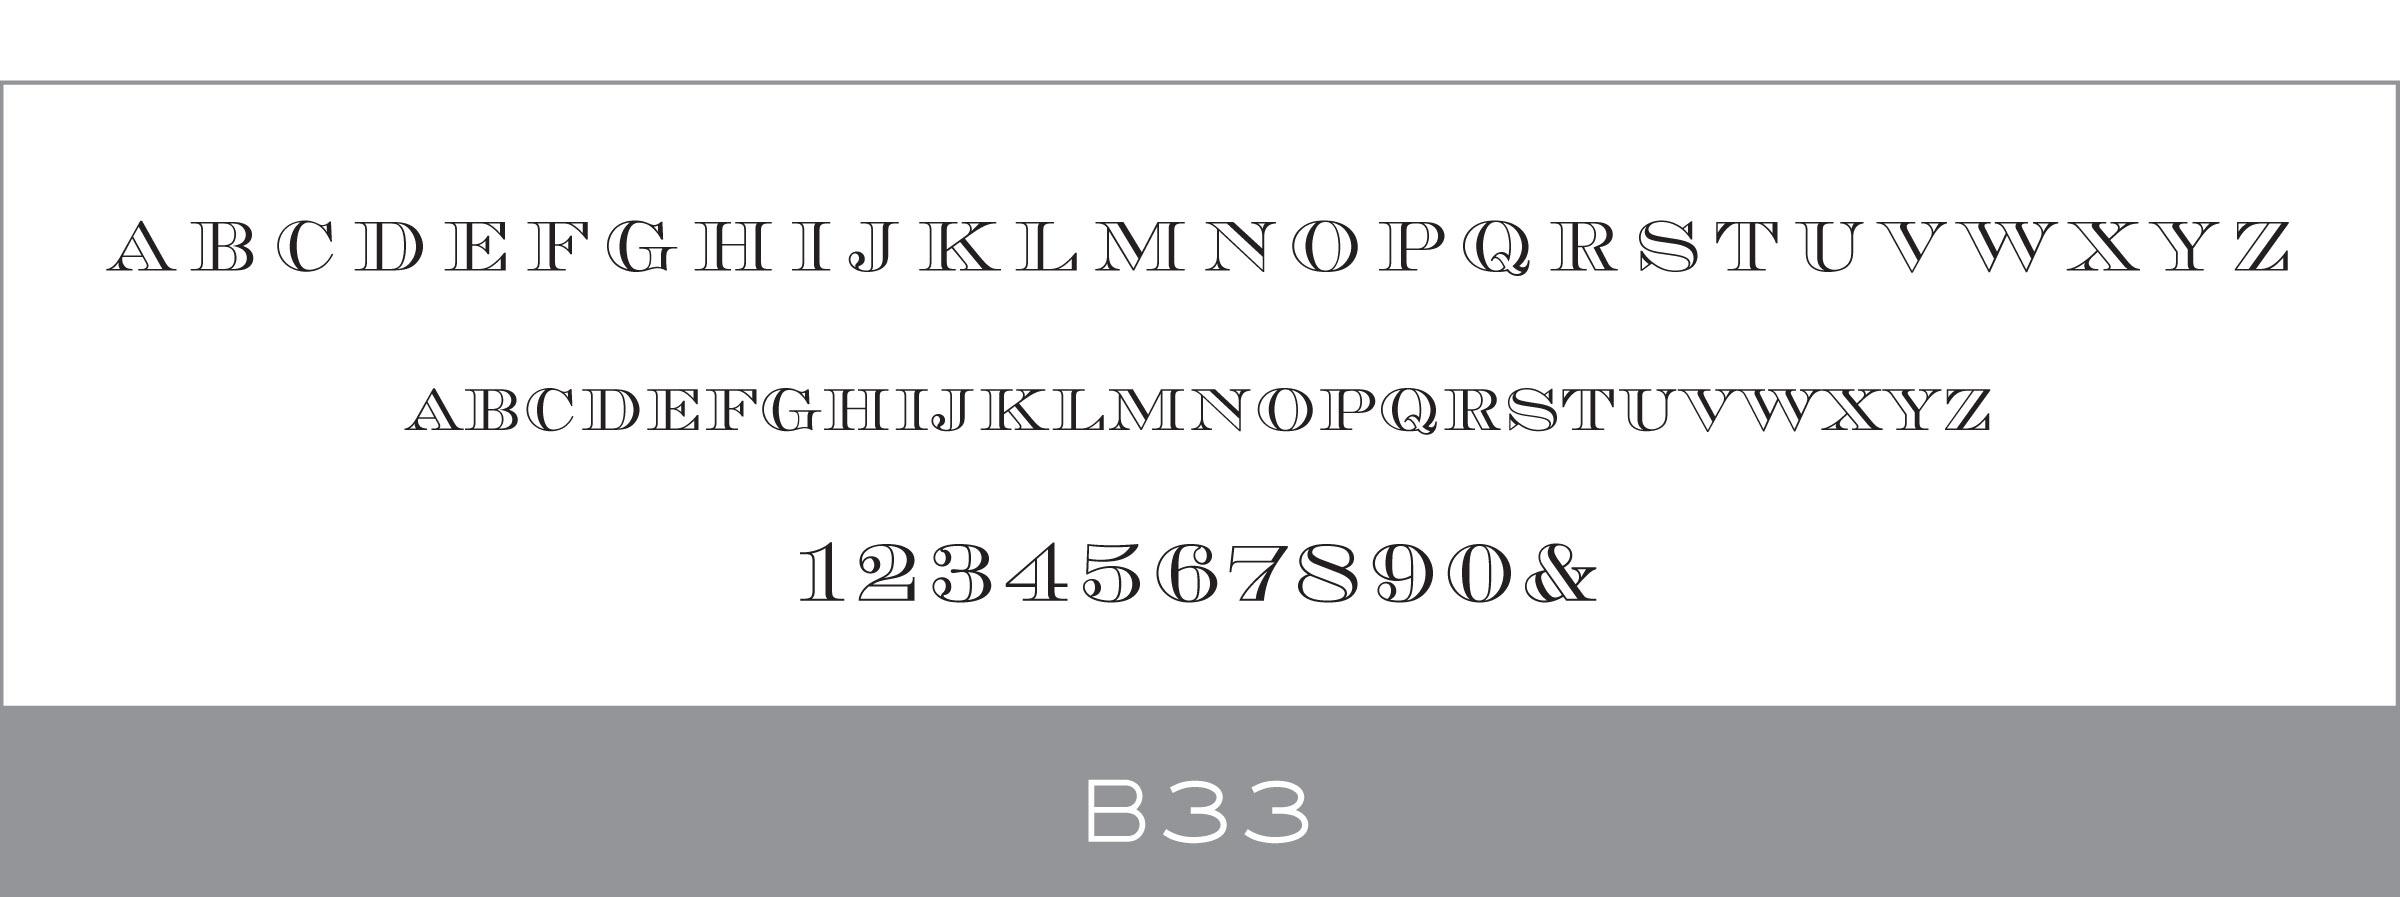 B33_Haute_Papier_Font.jpg